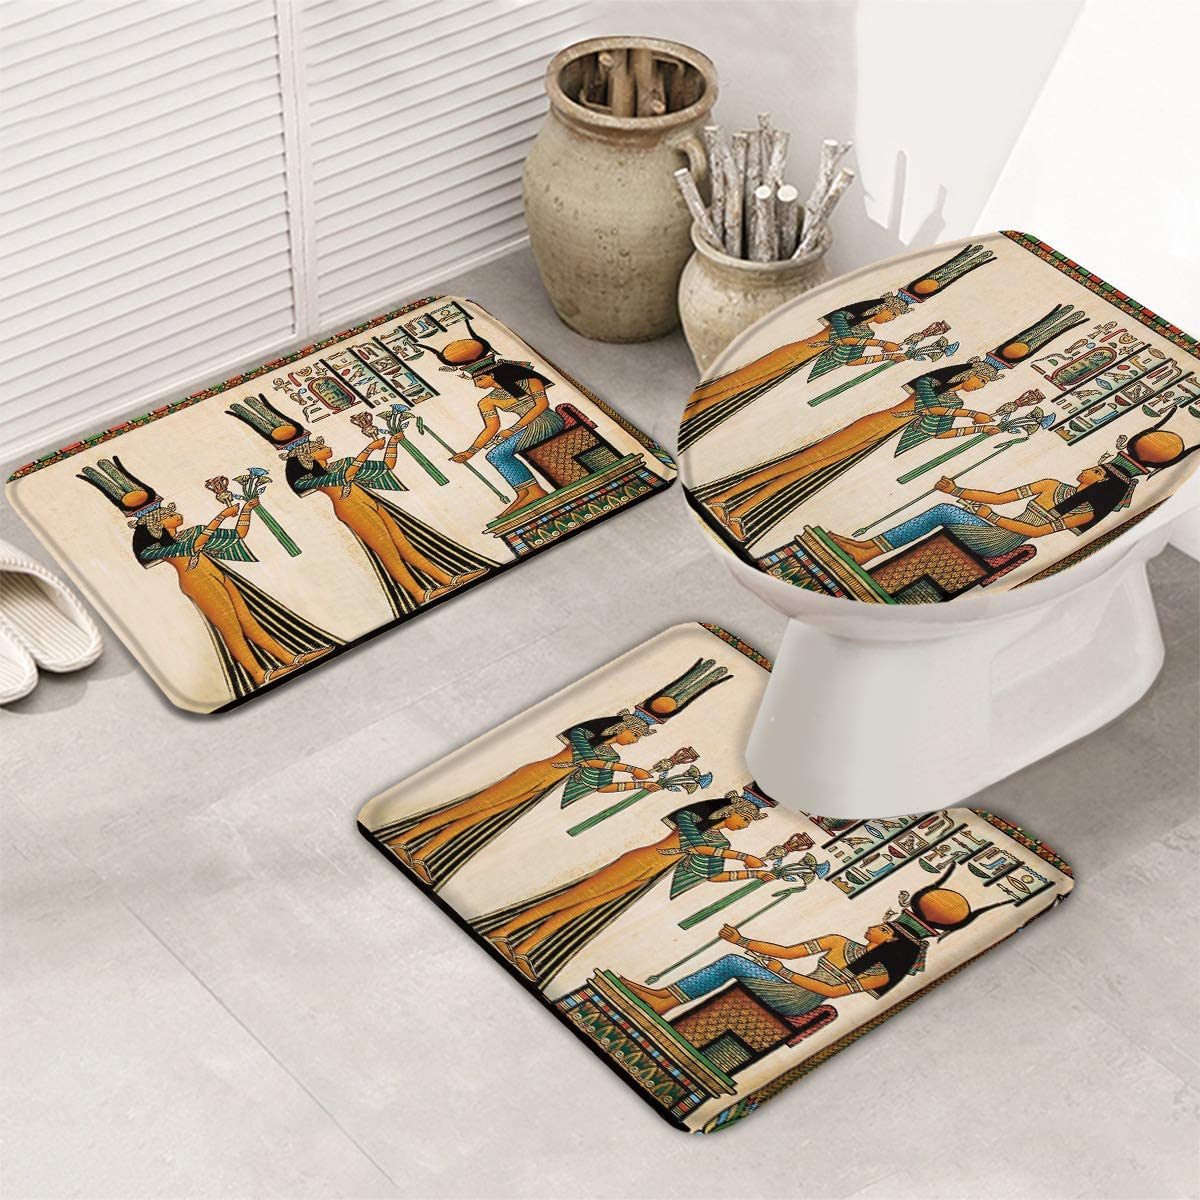 IDOWMAT 3 Piece Bath Rug Civilization and Mats Be Louisville-Jefferson County Mall super welcome Bathroom Mural Ru